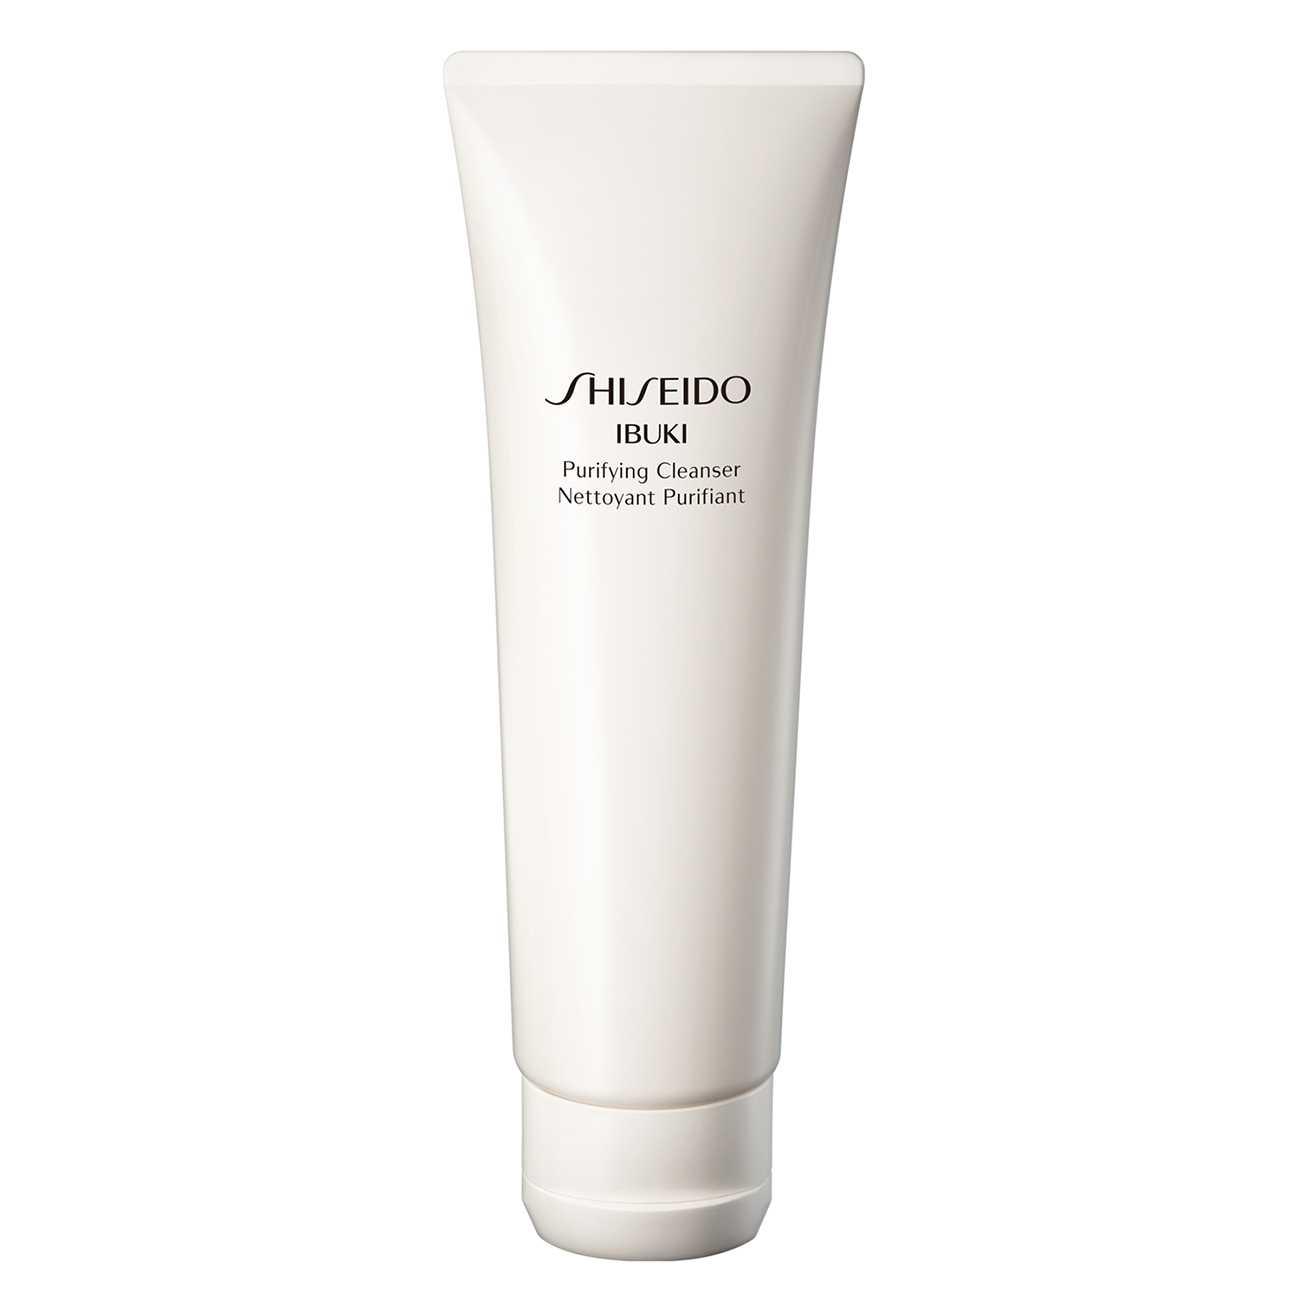 Ibuki Purifying Cleanser 125 Ml Shiseido imagine 2021 bestvalue.eu